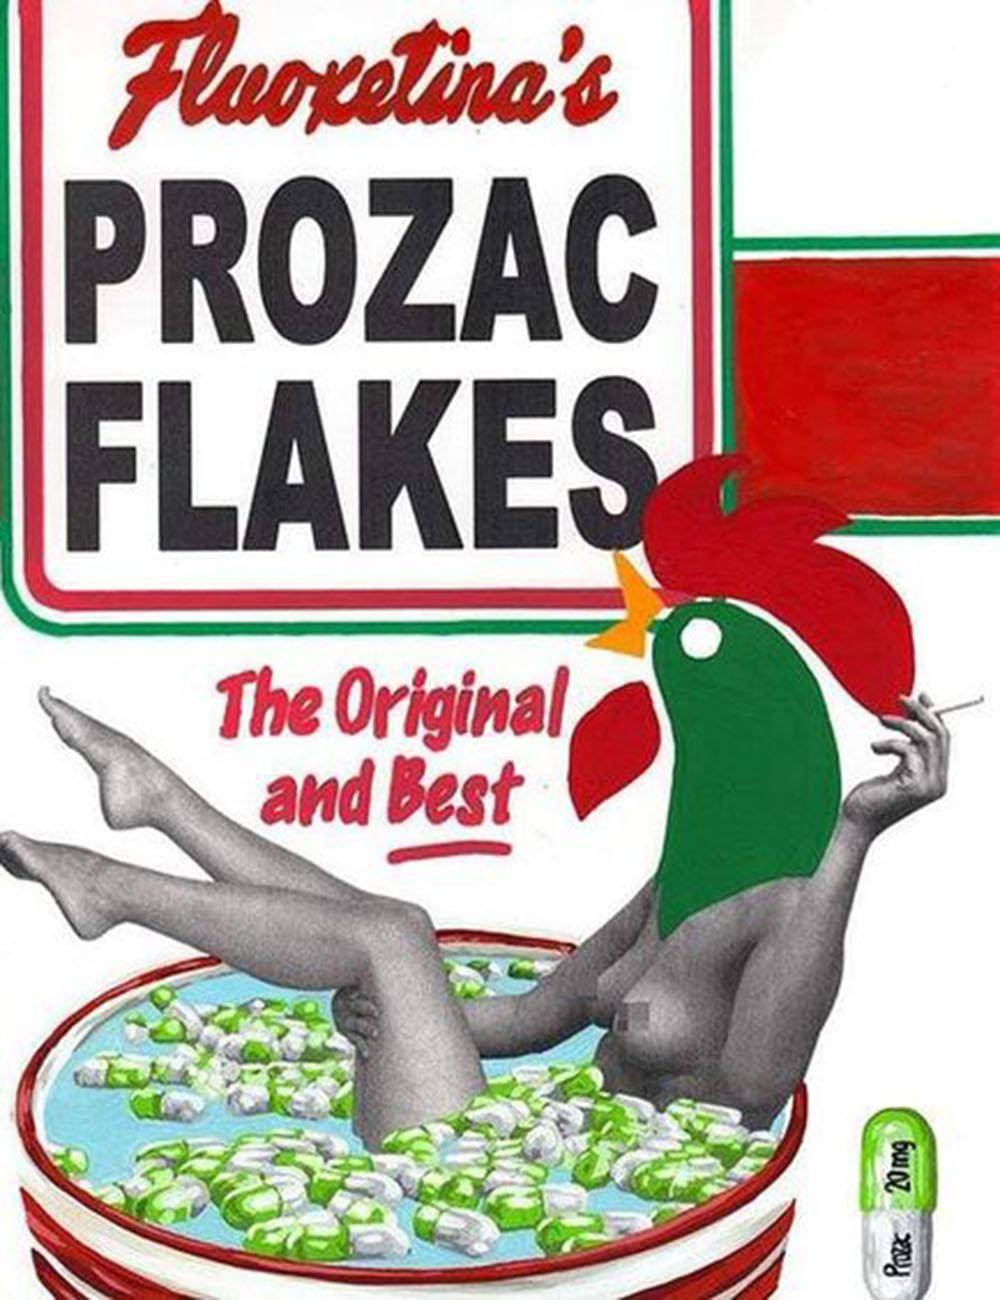 vinz feel free_opera prozac flakes